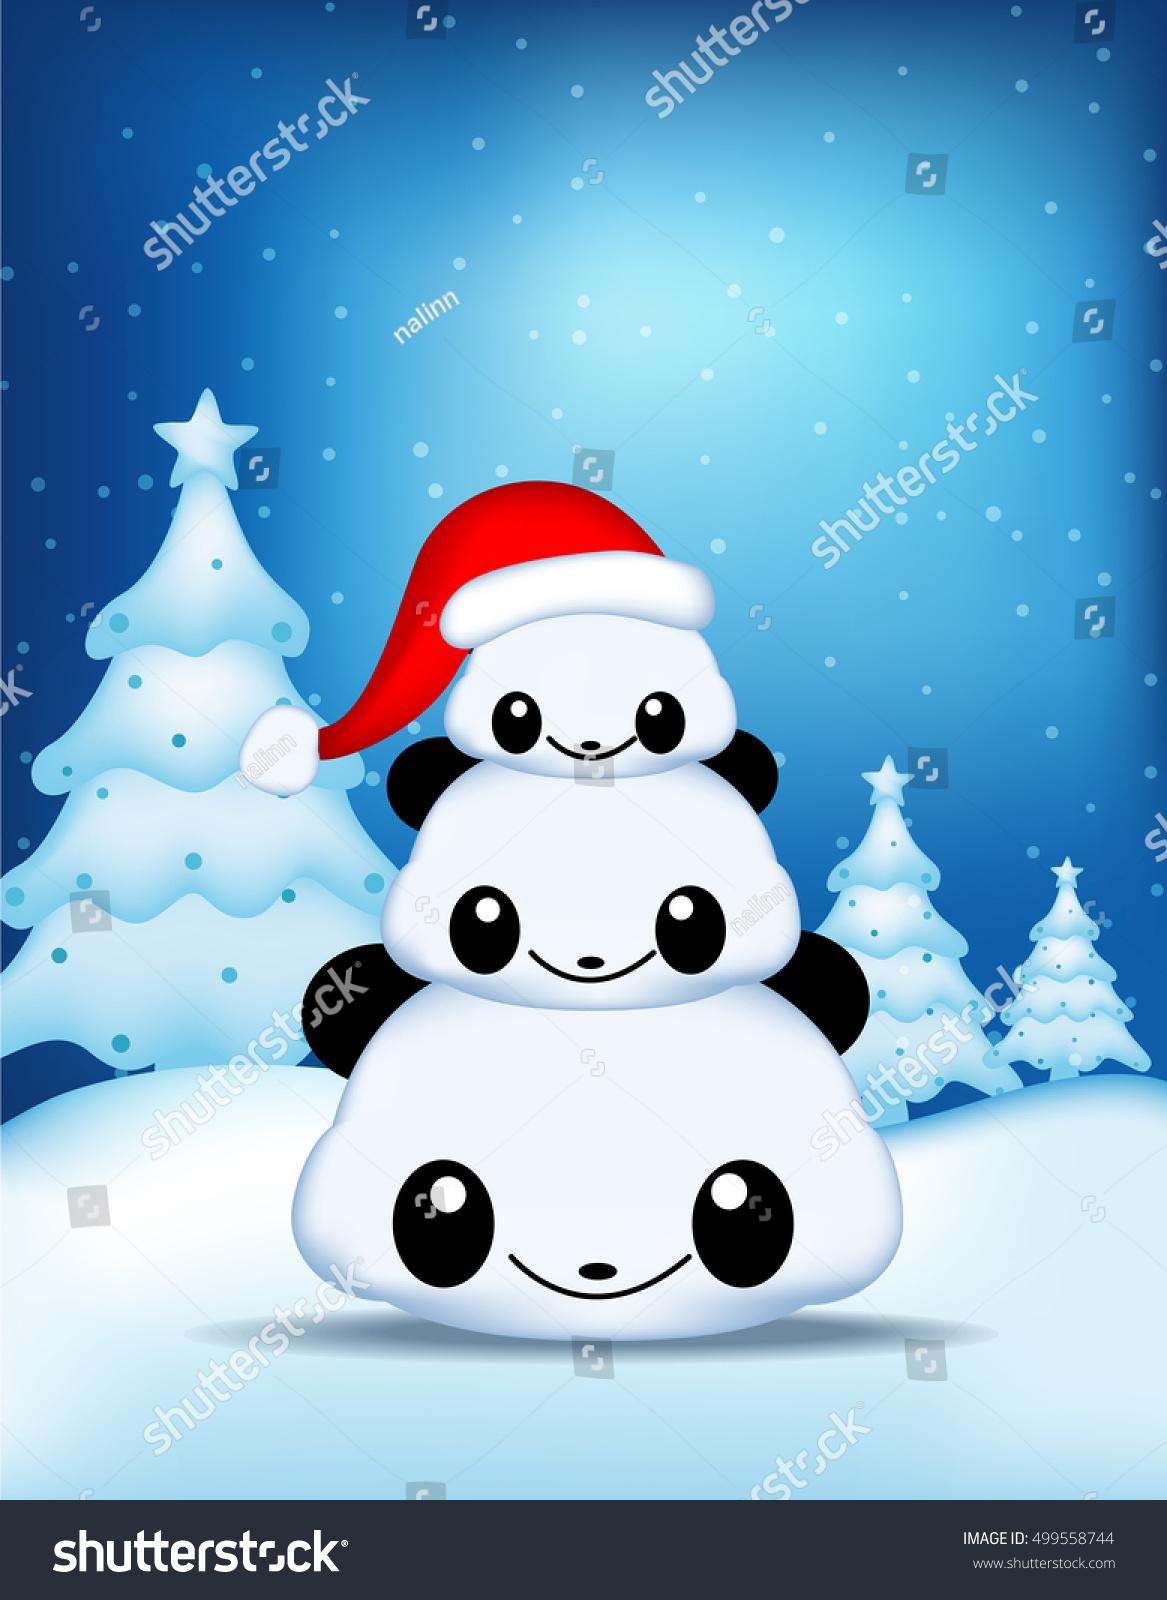 Three Cute Pandas Wishing Merry Christmas Stock Vector Royalty Free